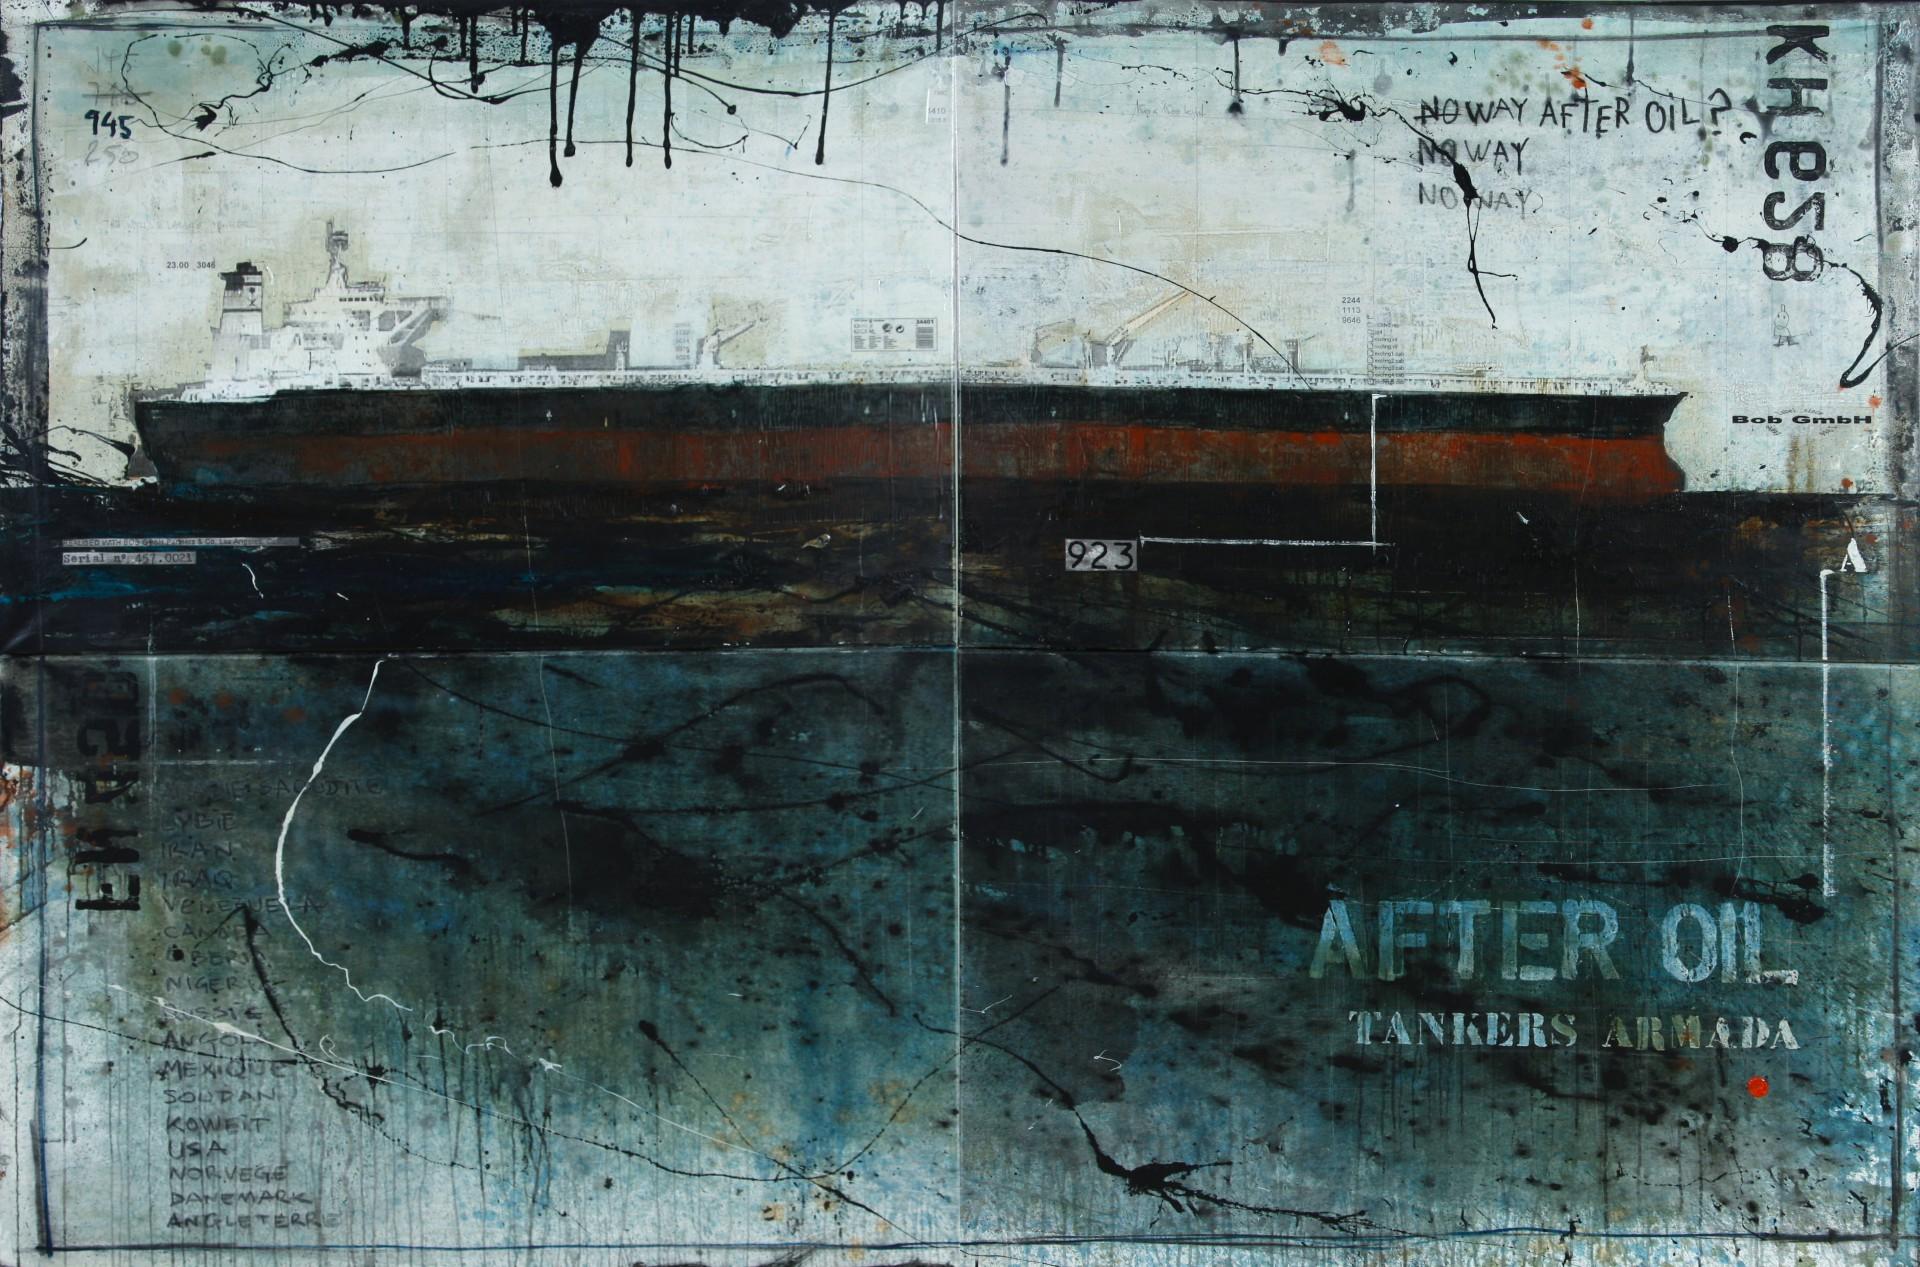 After Oil - Tankers Armada - collage photo, huile, acrylique sur toile - 160 x 240 cm - 2012